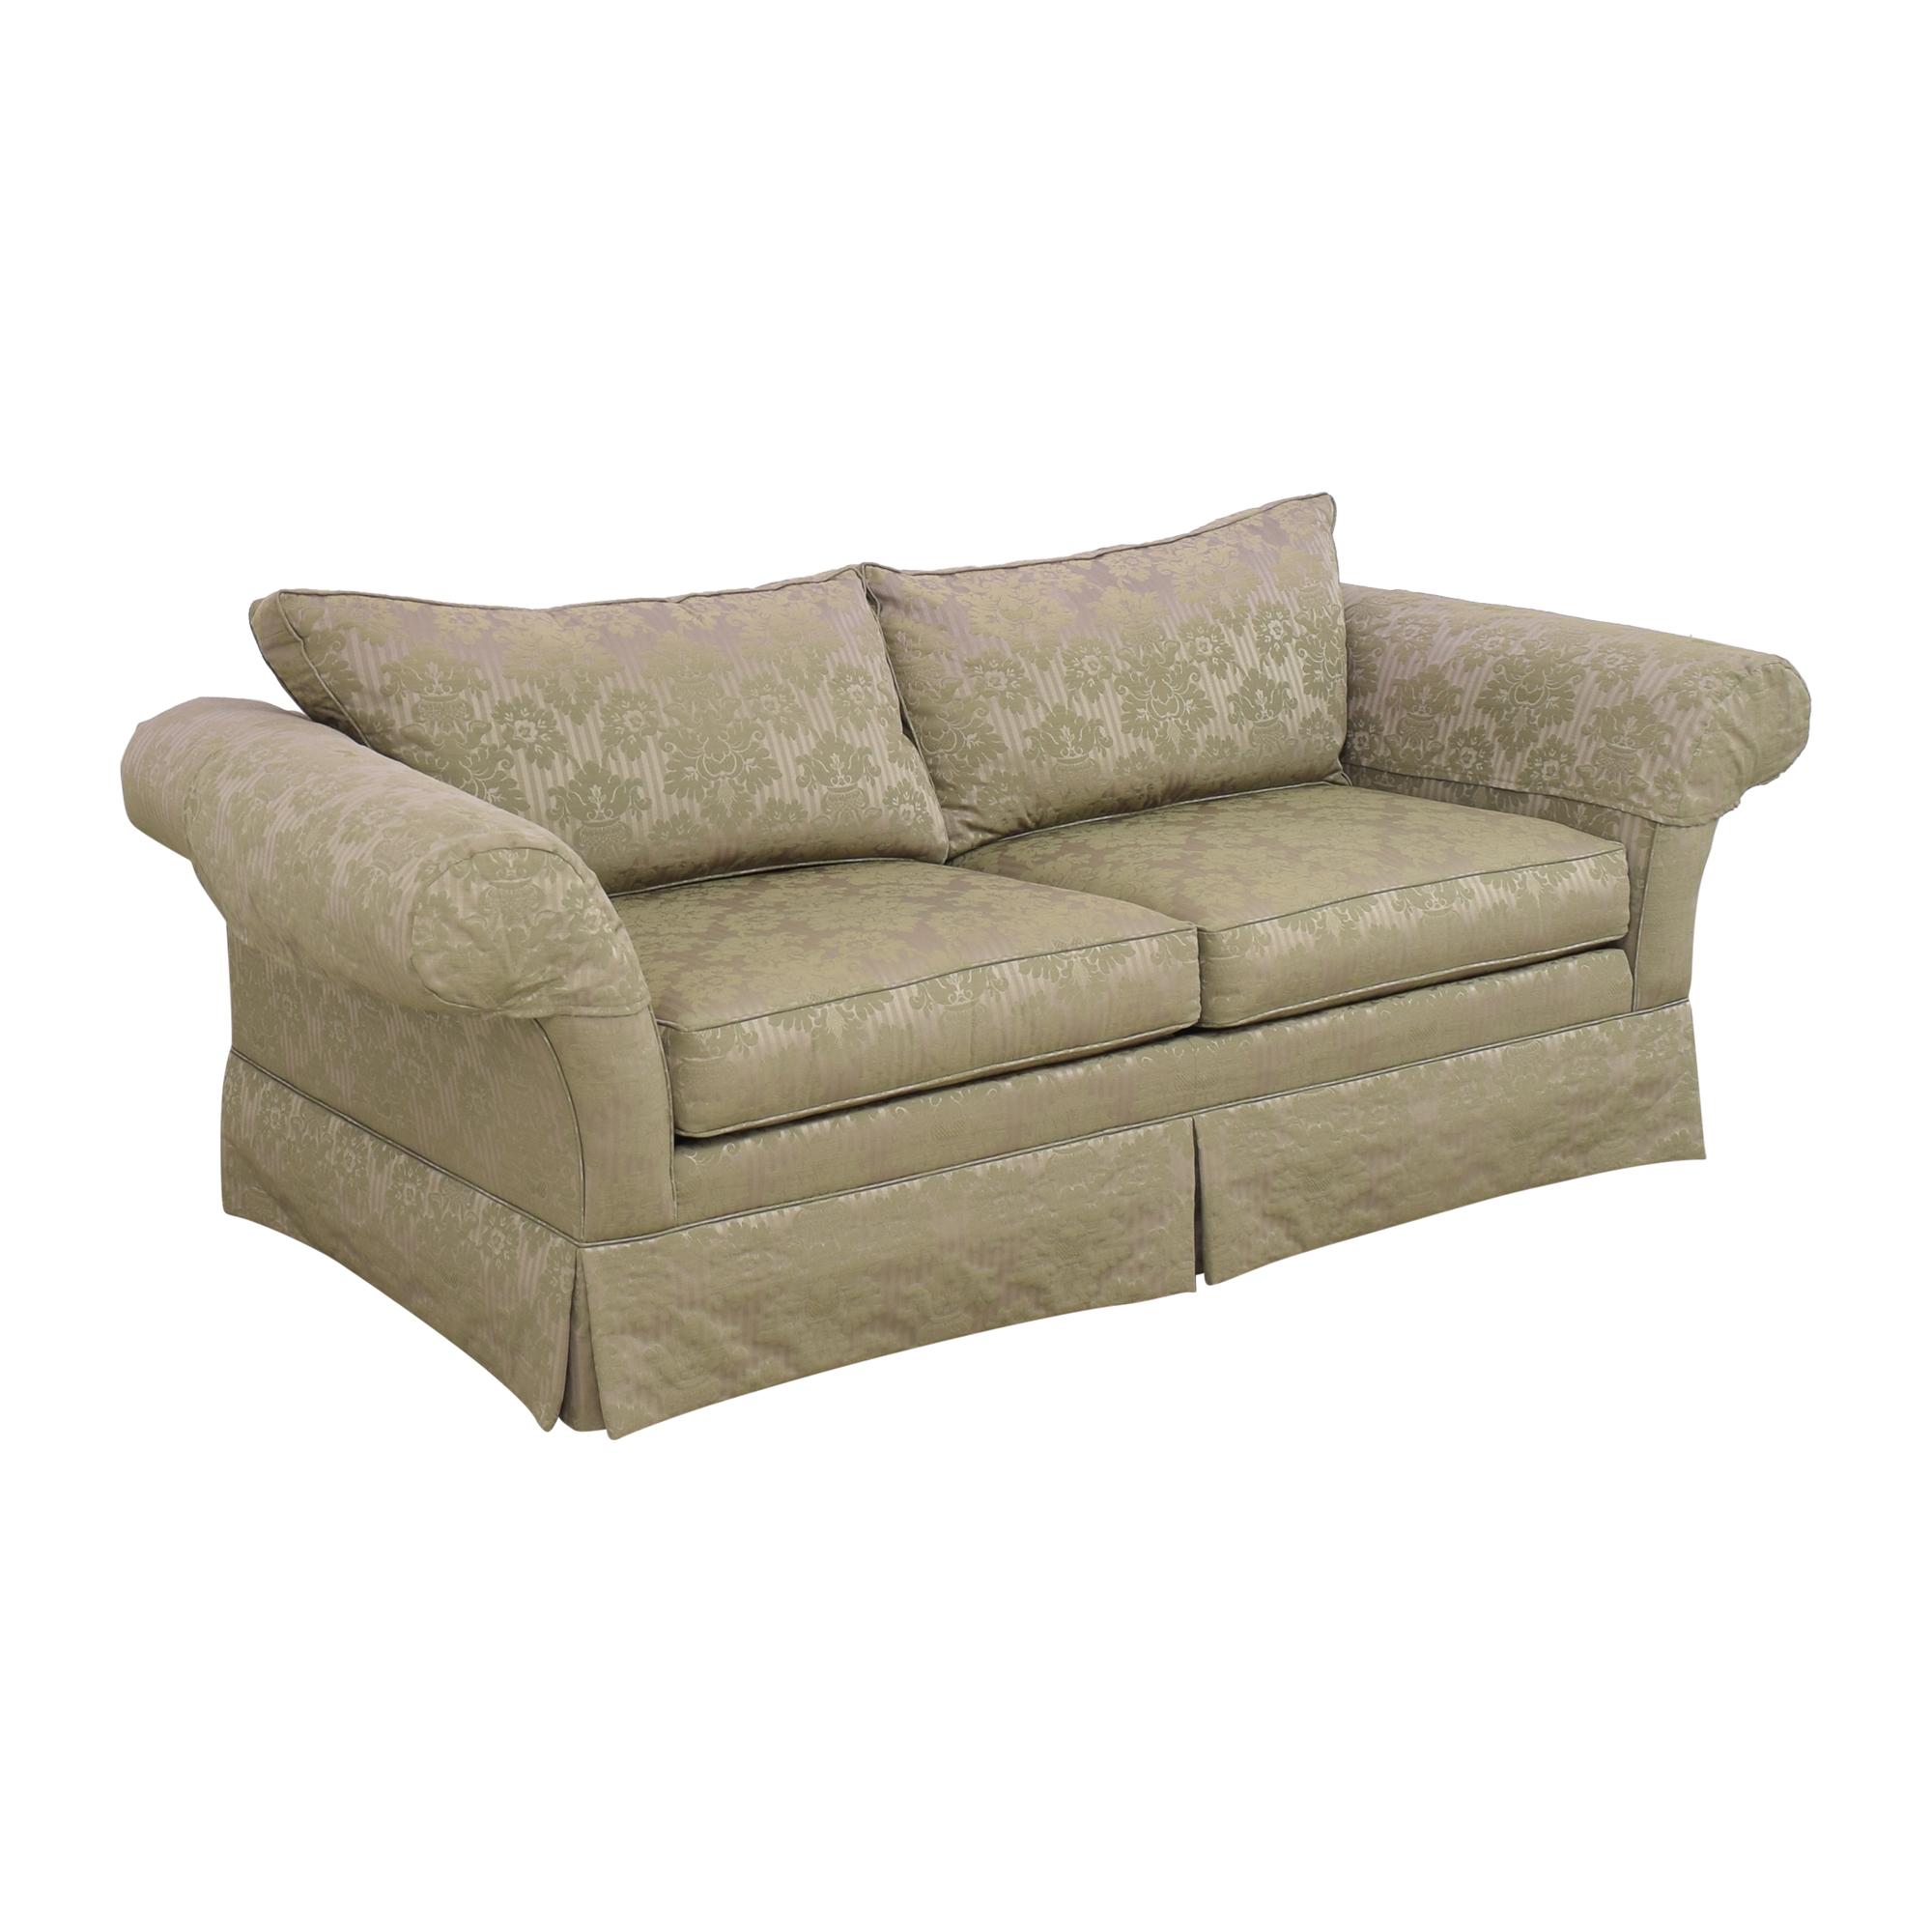 shop Ethan Allen Two Cushion Roll Arm Sofa Ethan Allen Sofas